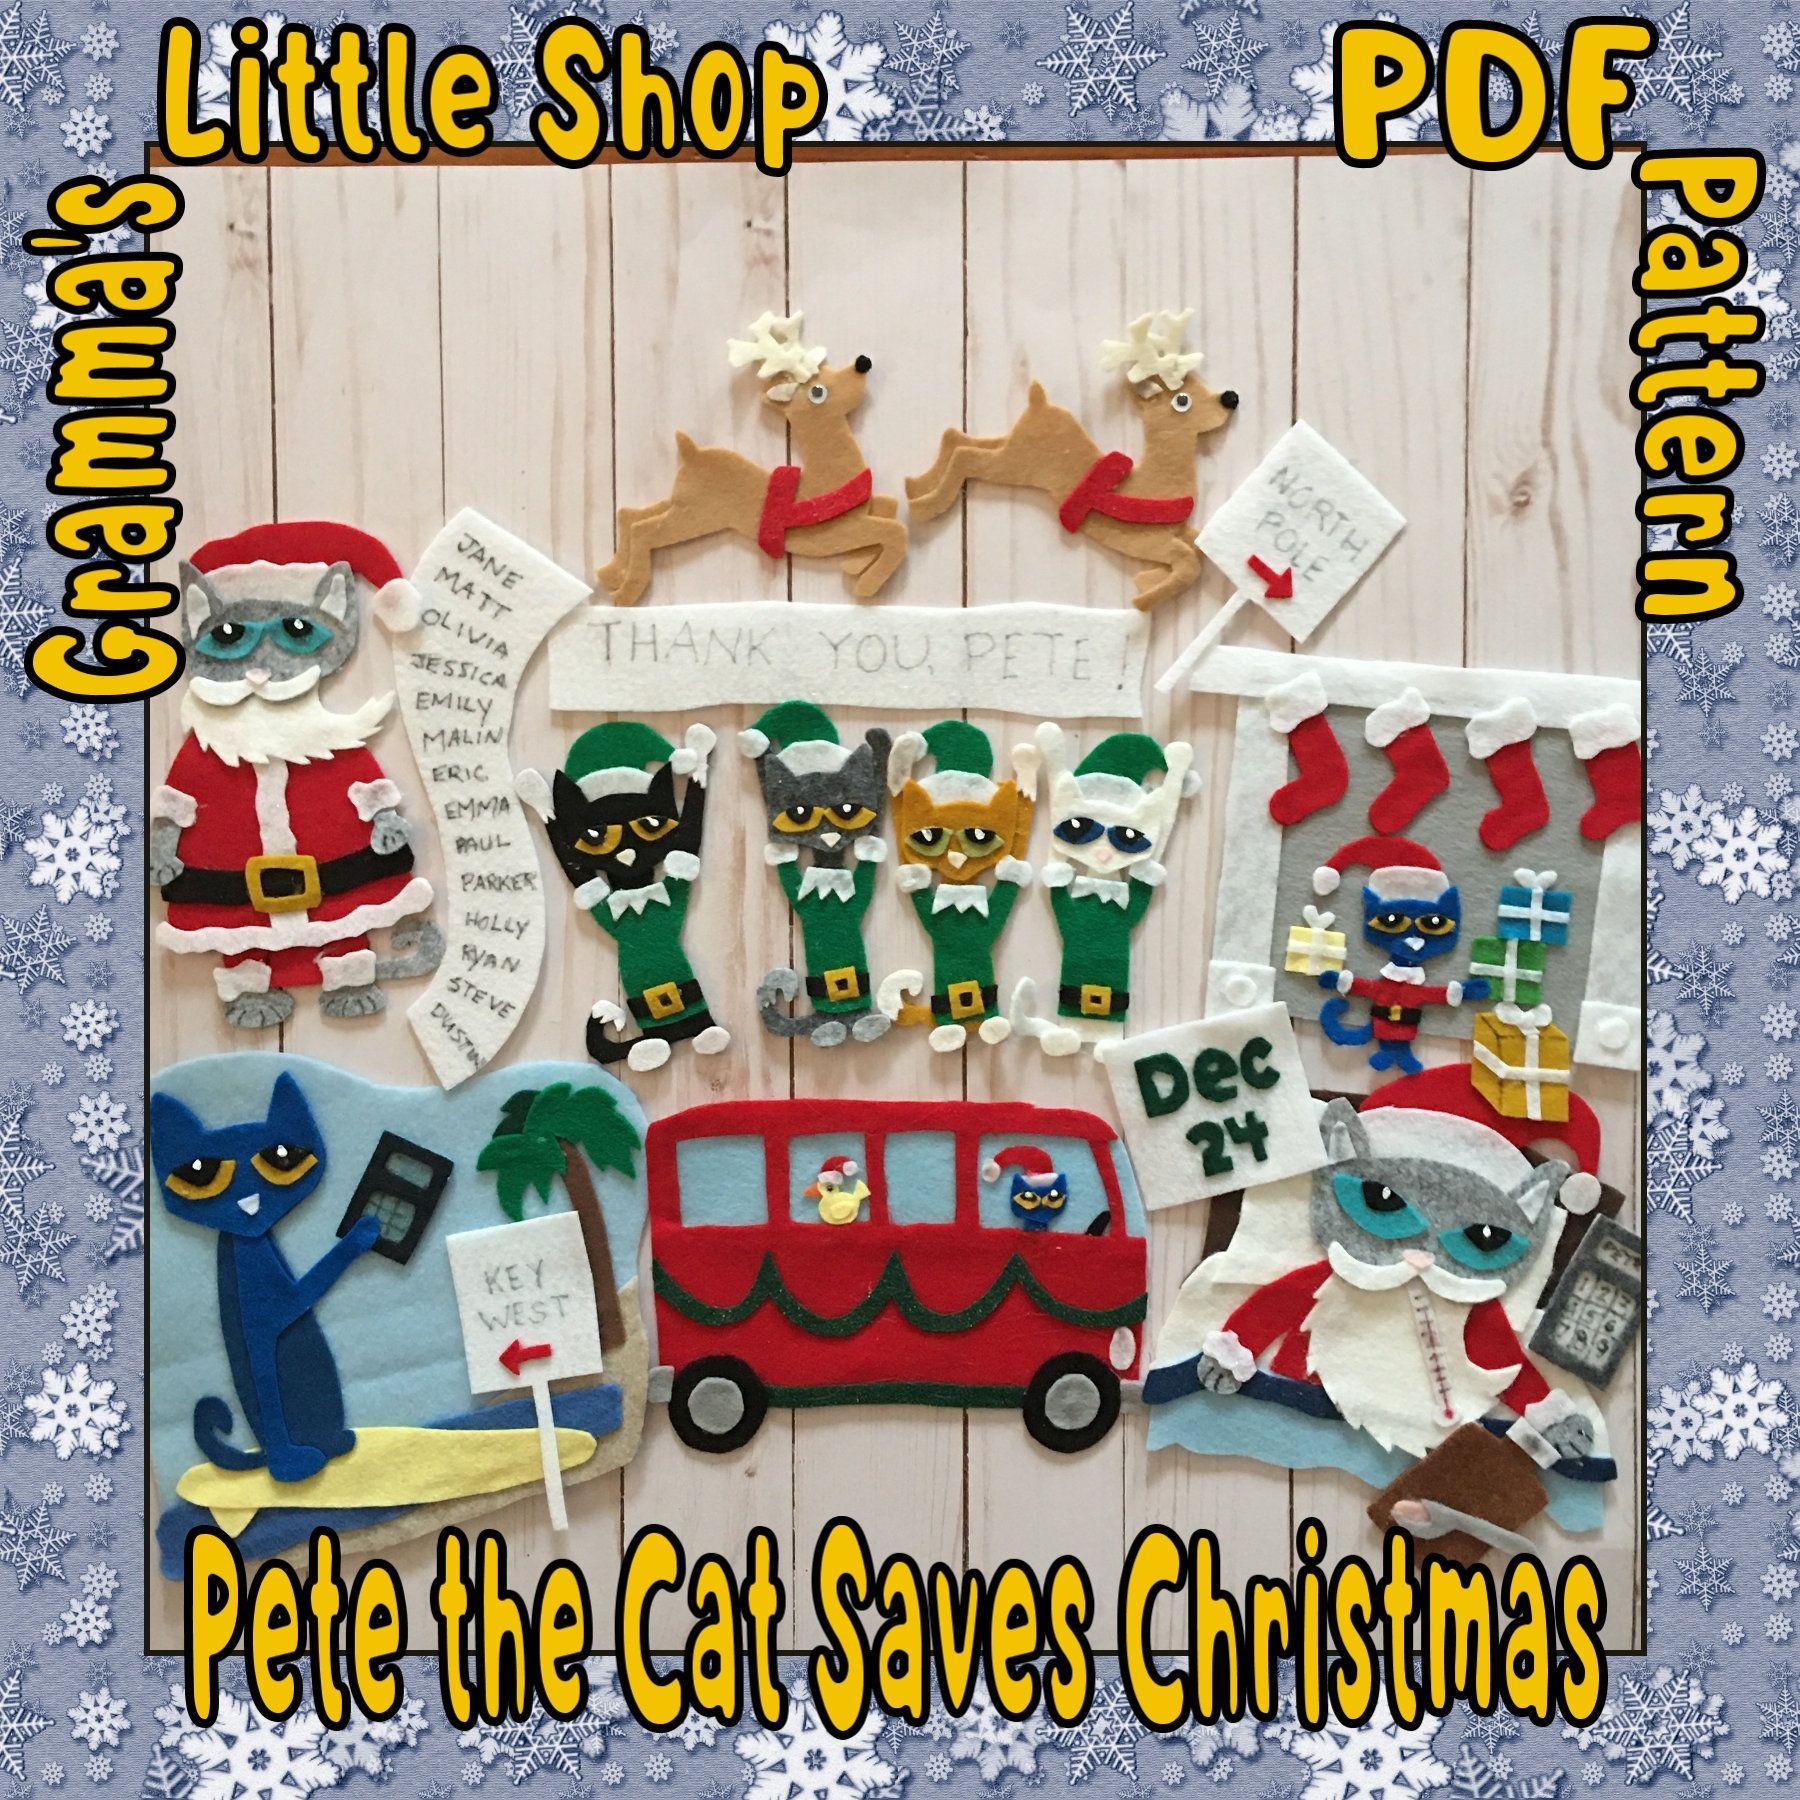 Pete The Cat Saves Christmas Felt Story Pattern